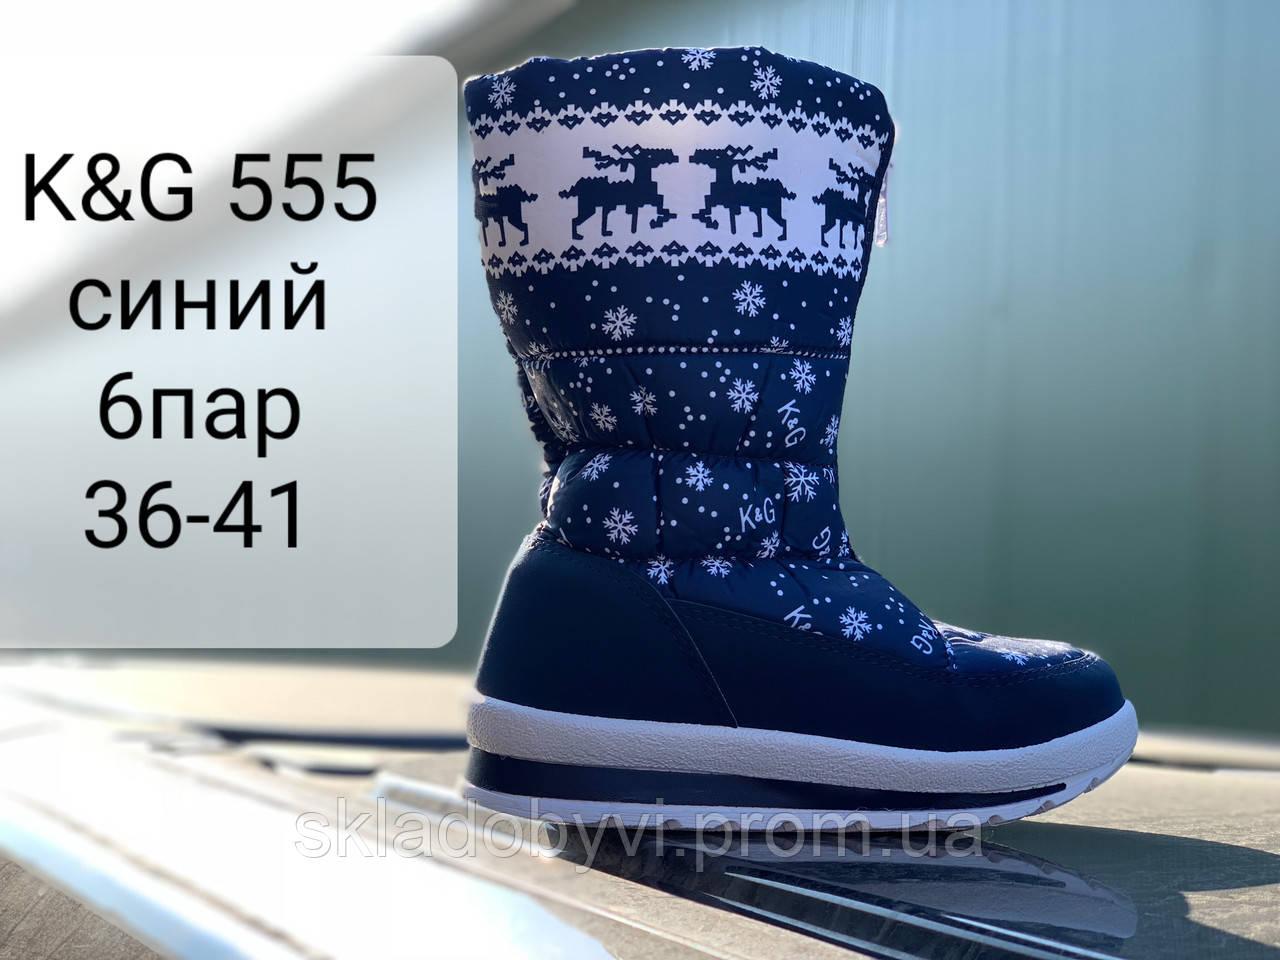 ЖЕНСКИЕ САПОГИ ДУТИКИ 555